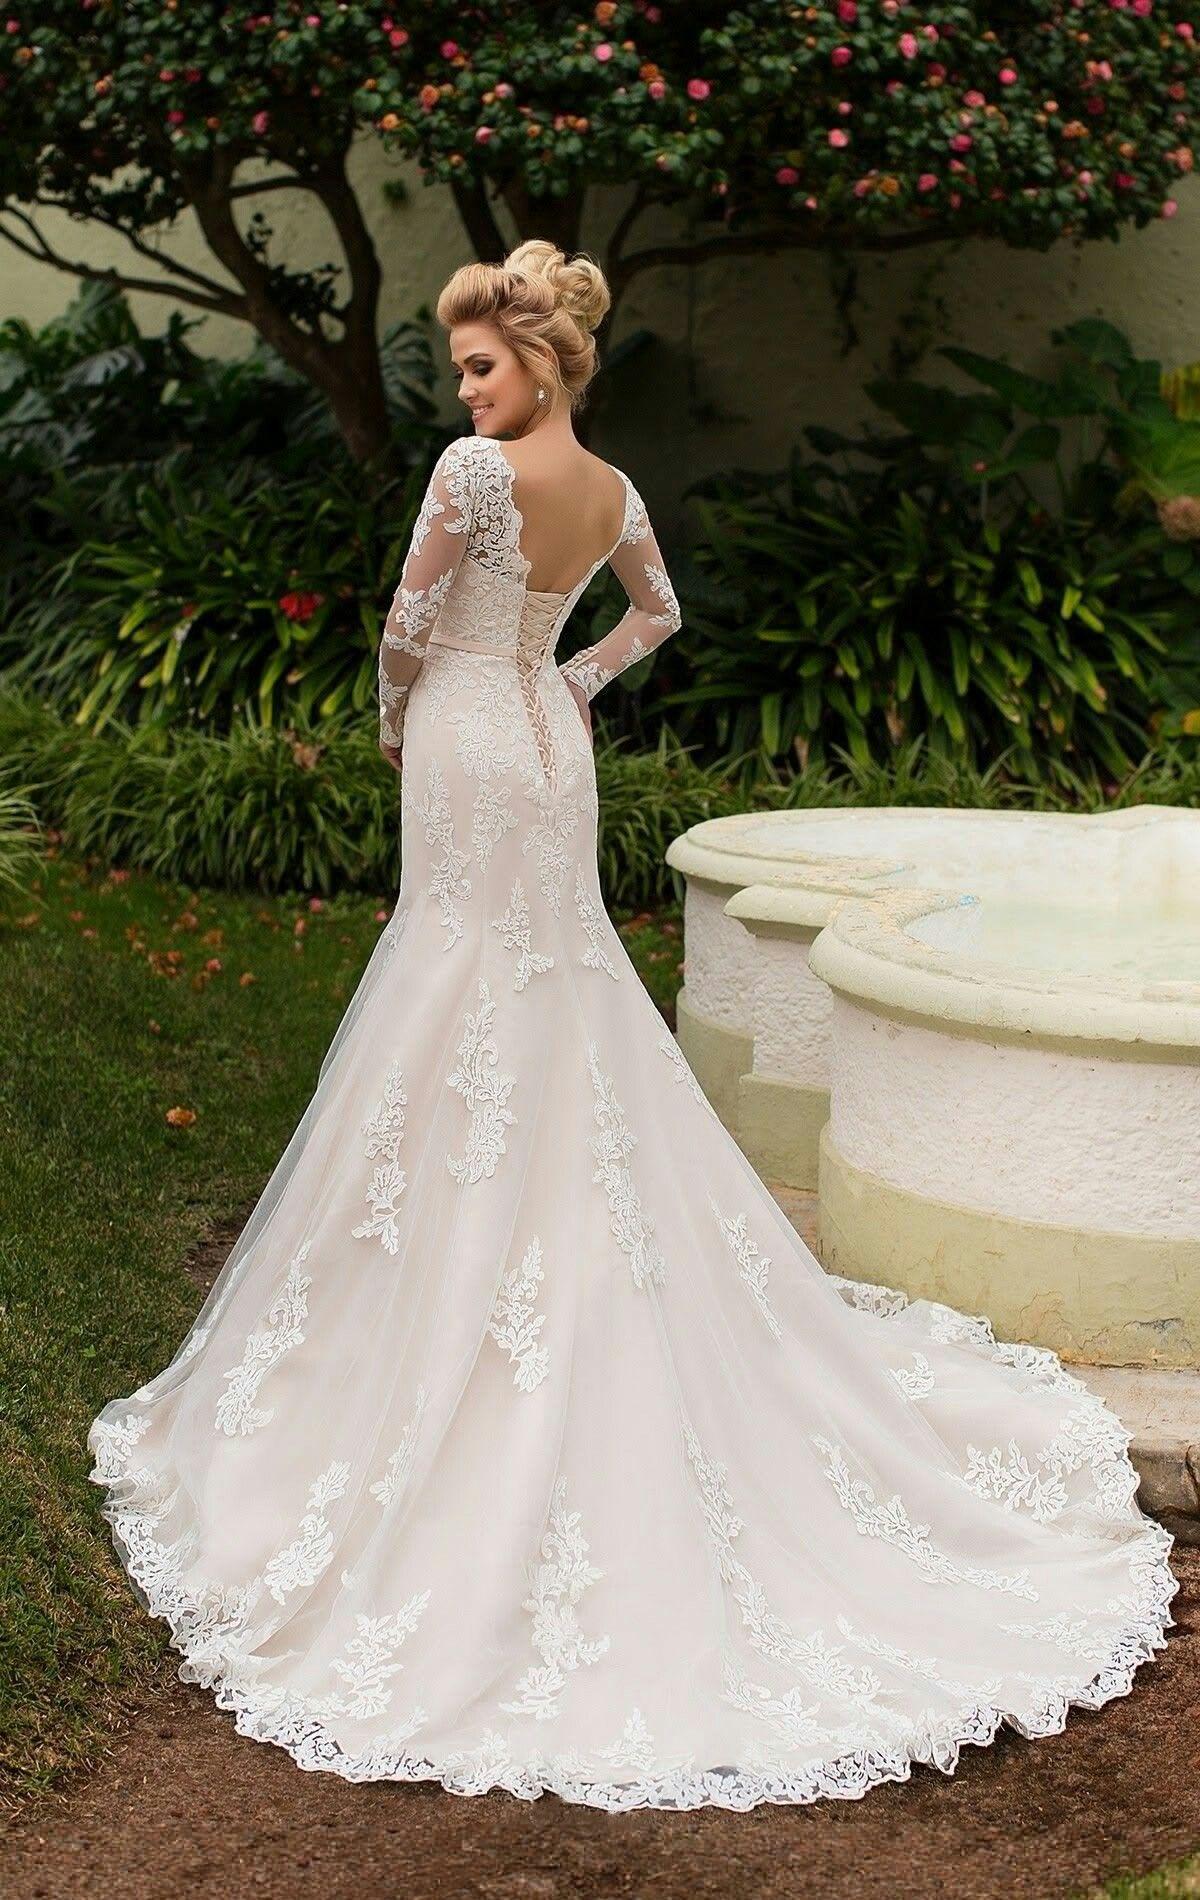 Nice dresses for wedding  Pin by Vanda Desiree on Wedding dresses  Pinterest  Wedding